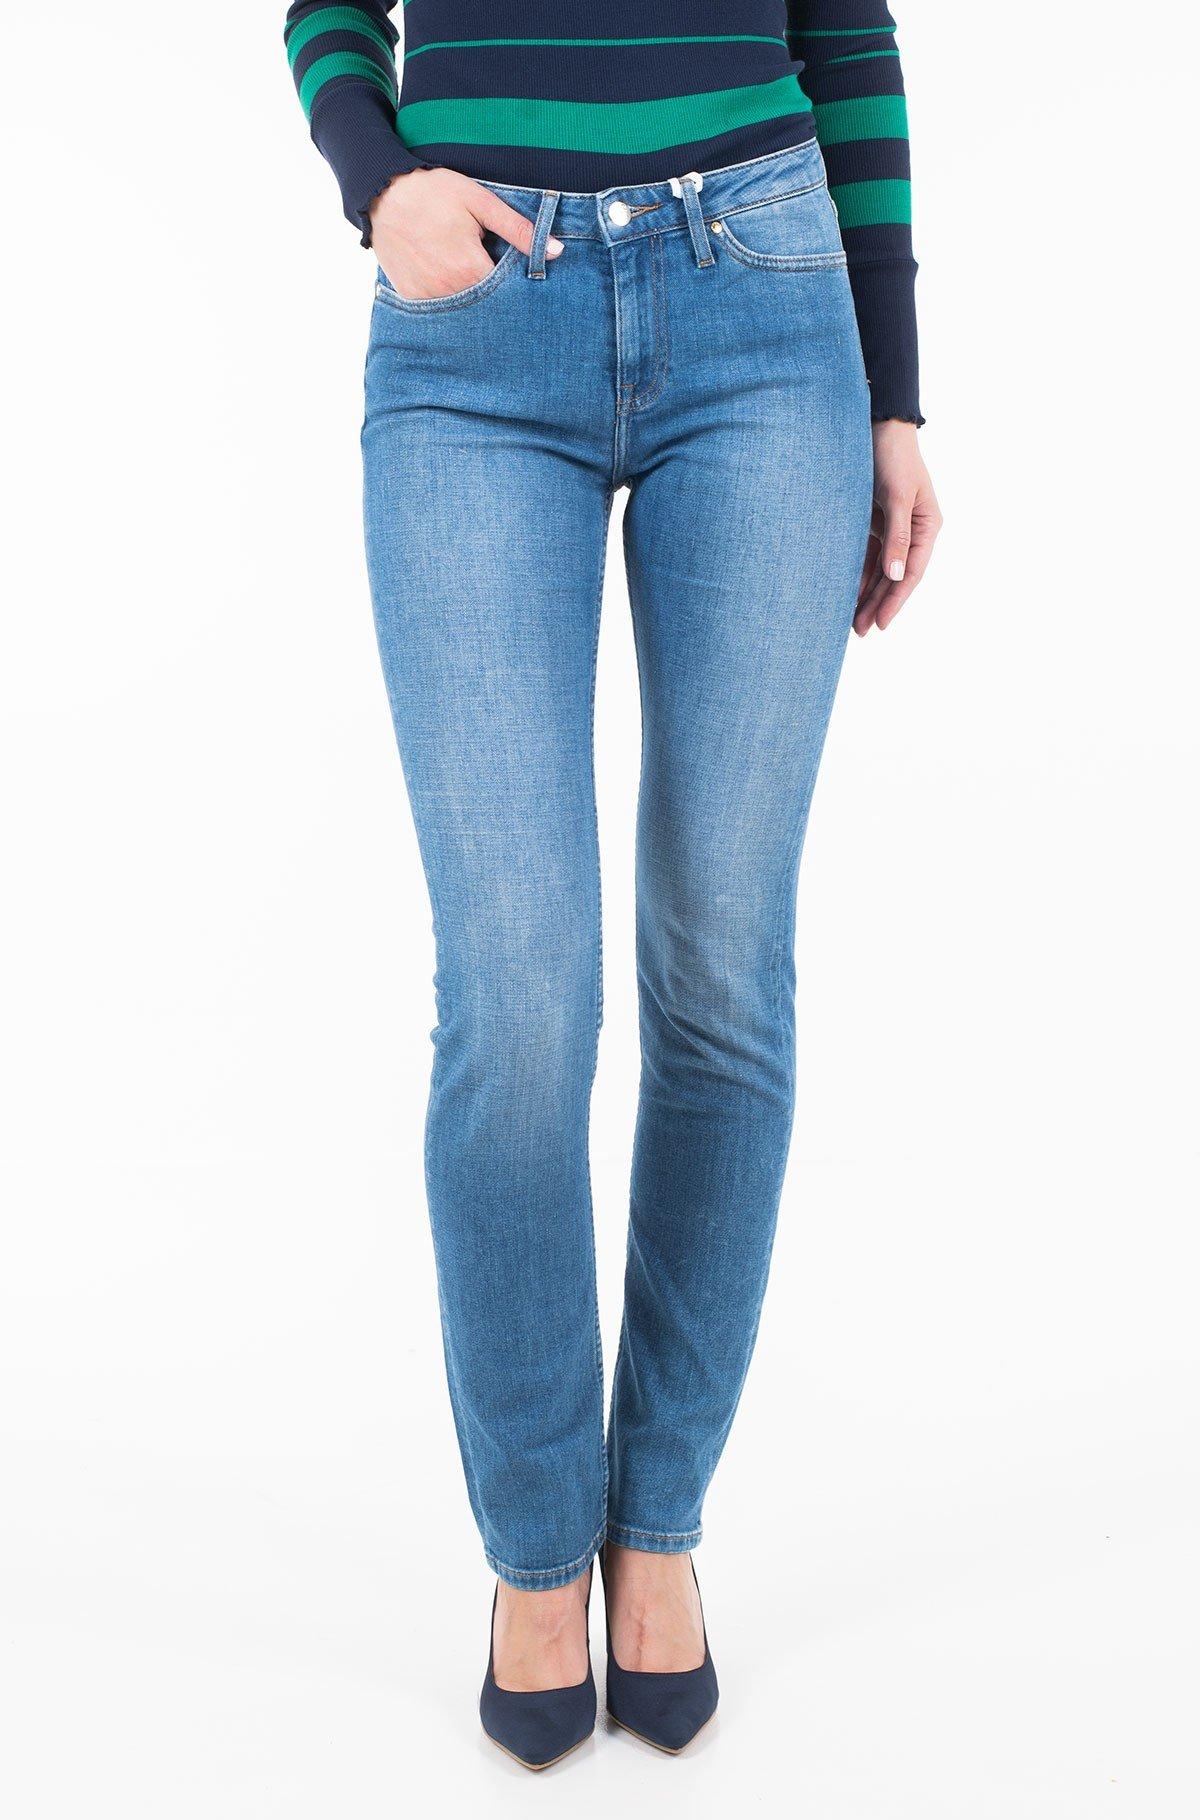 Jeans ROME STRAIGHT RW PONYO-full-1